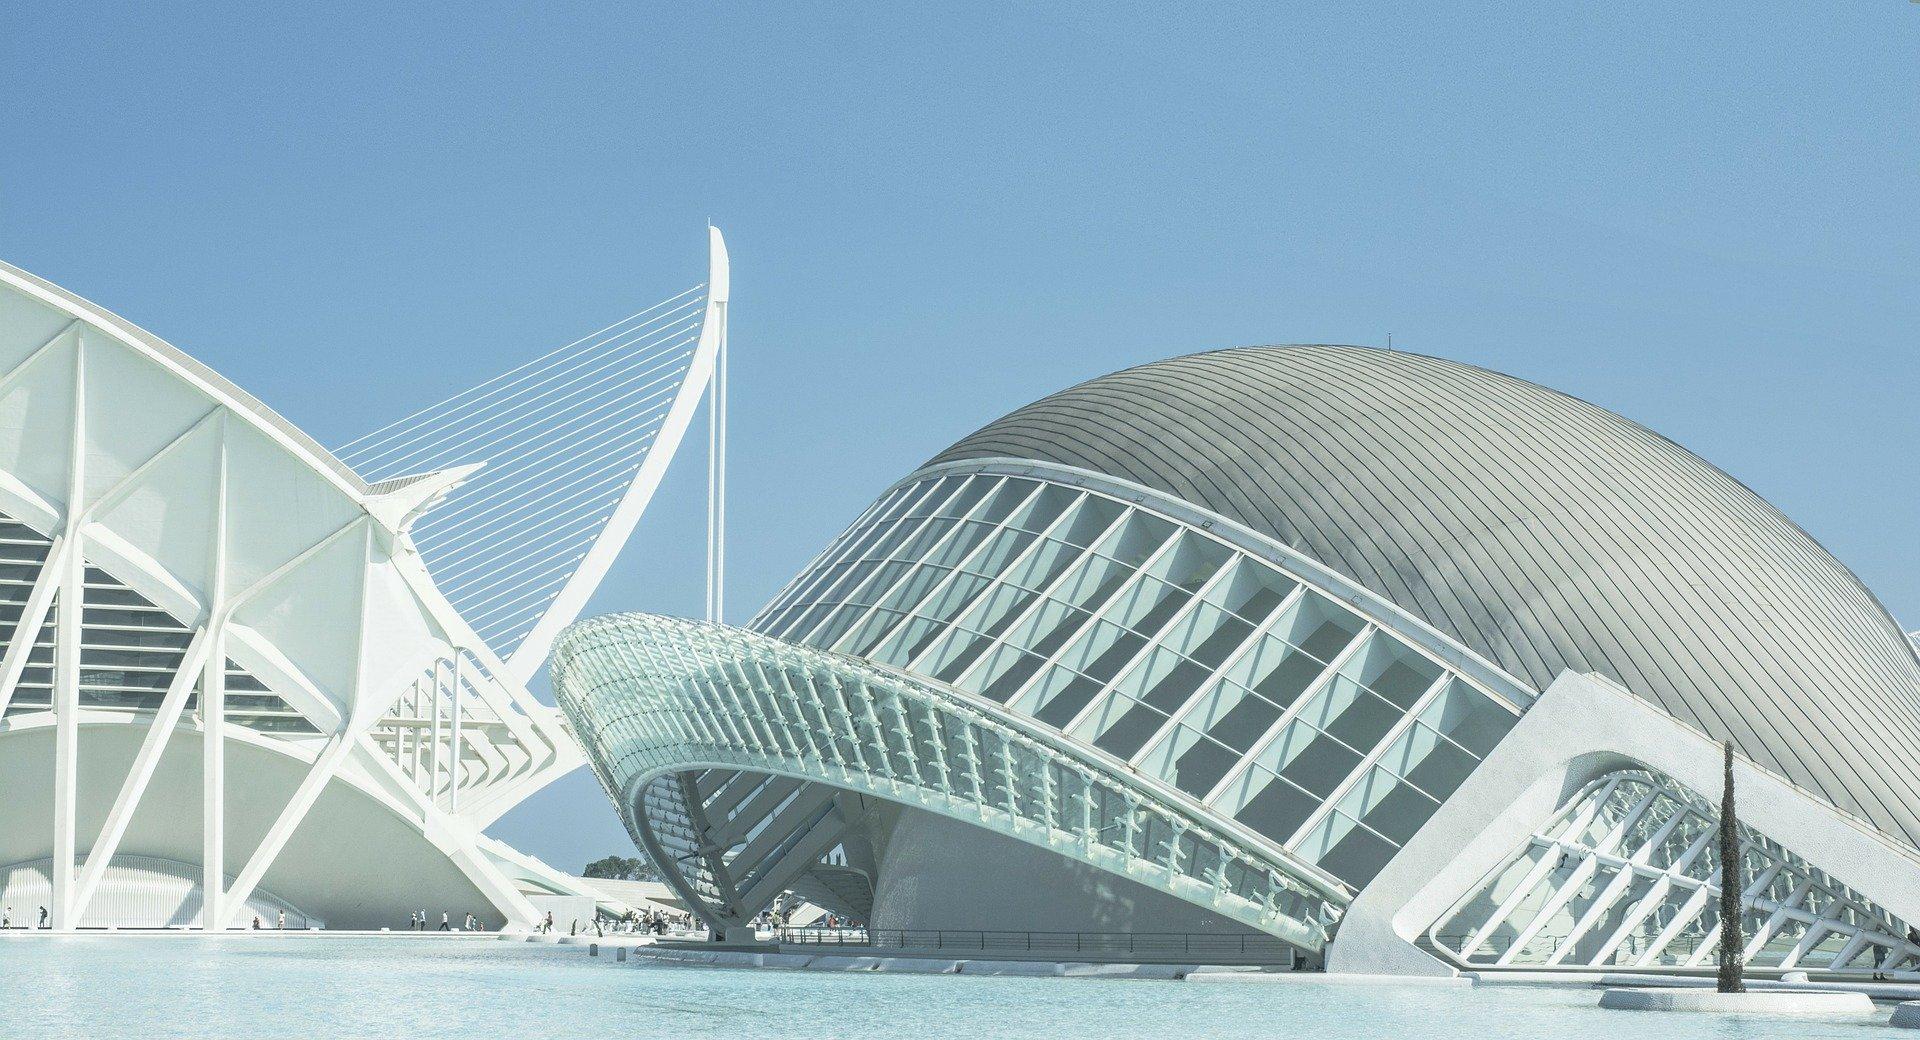 Viaje Fin de Curso en Valencia